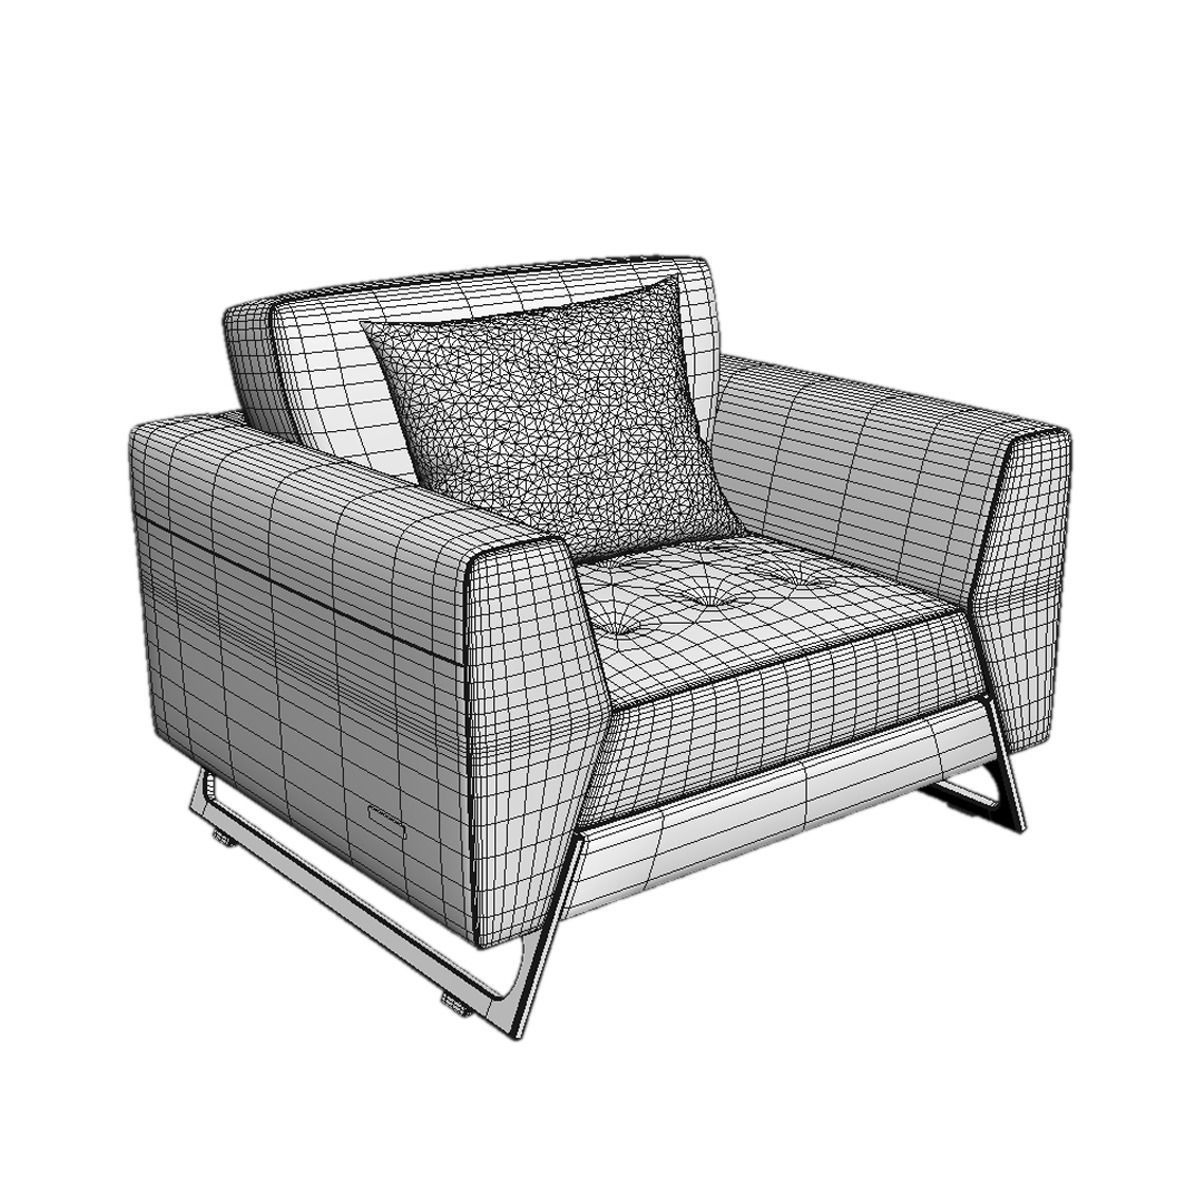 Roche bobois satelis canape sofa and armchair free 3d for Canape en solde roche bobois